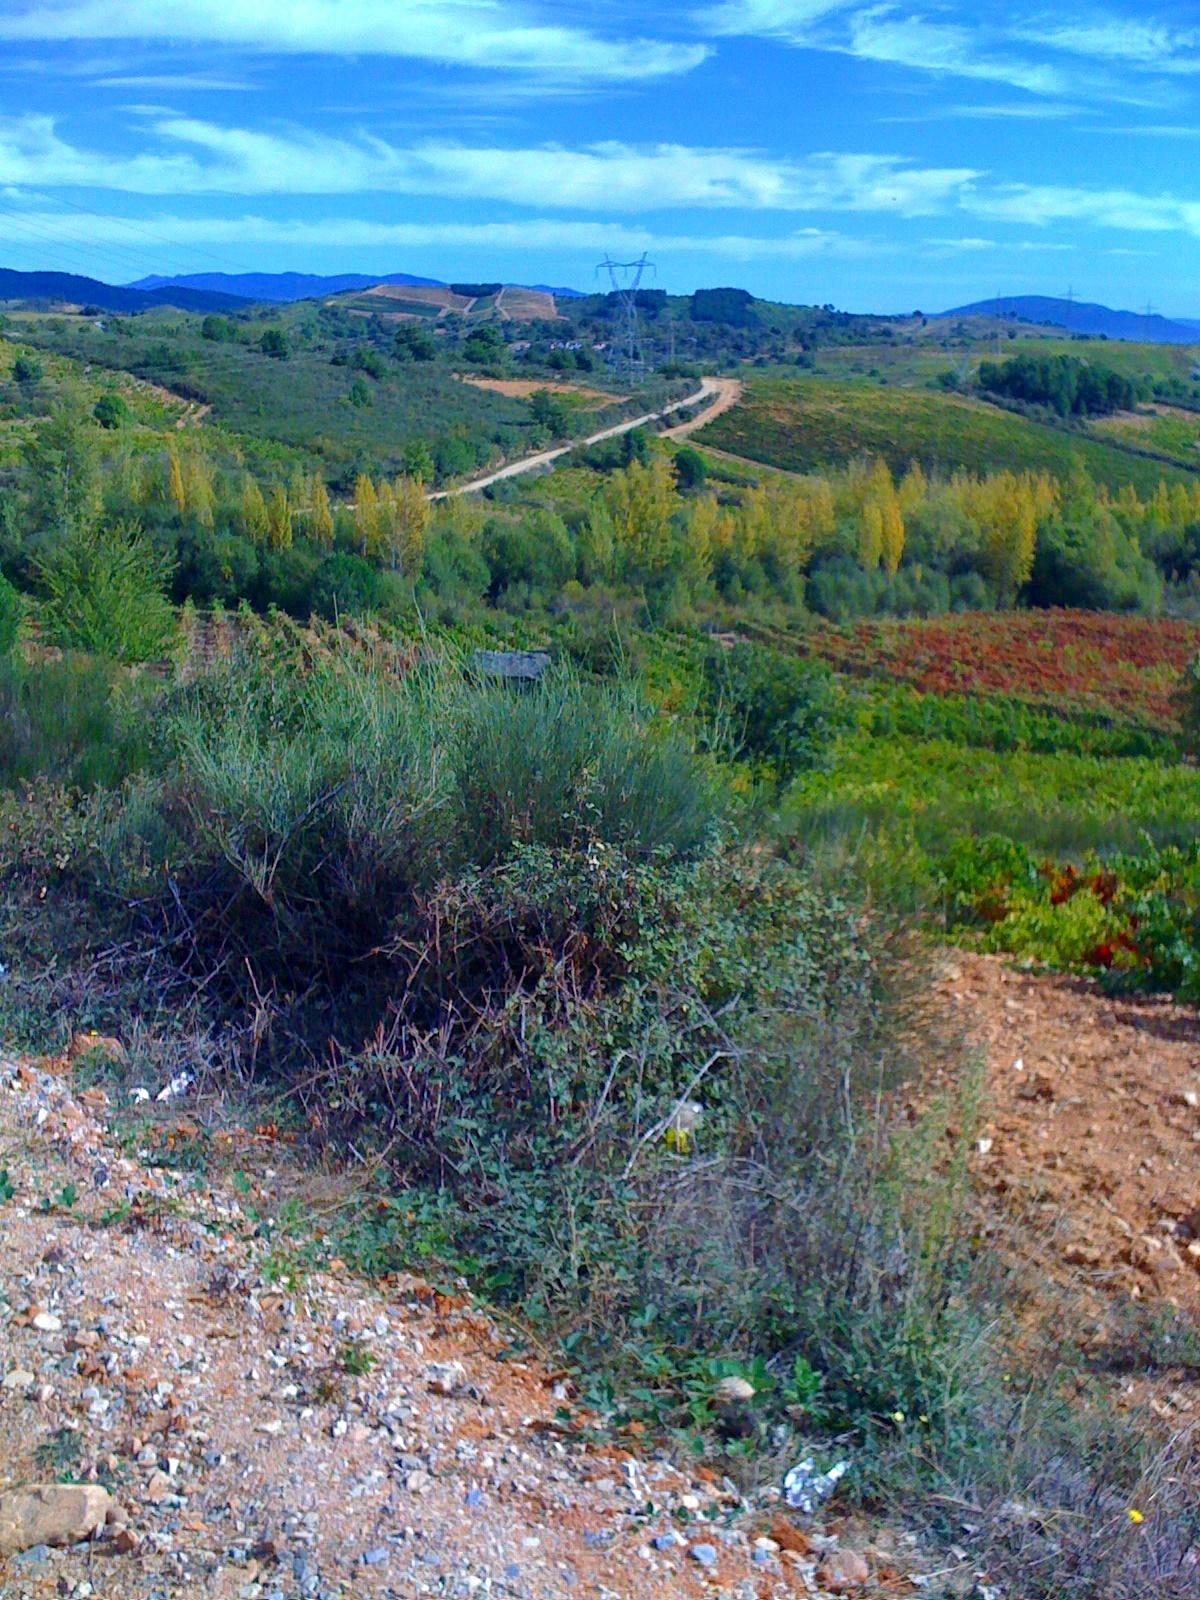 auf dem Weg nach Villa Franca del Bierzo